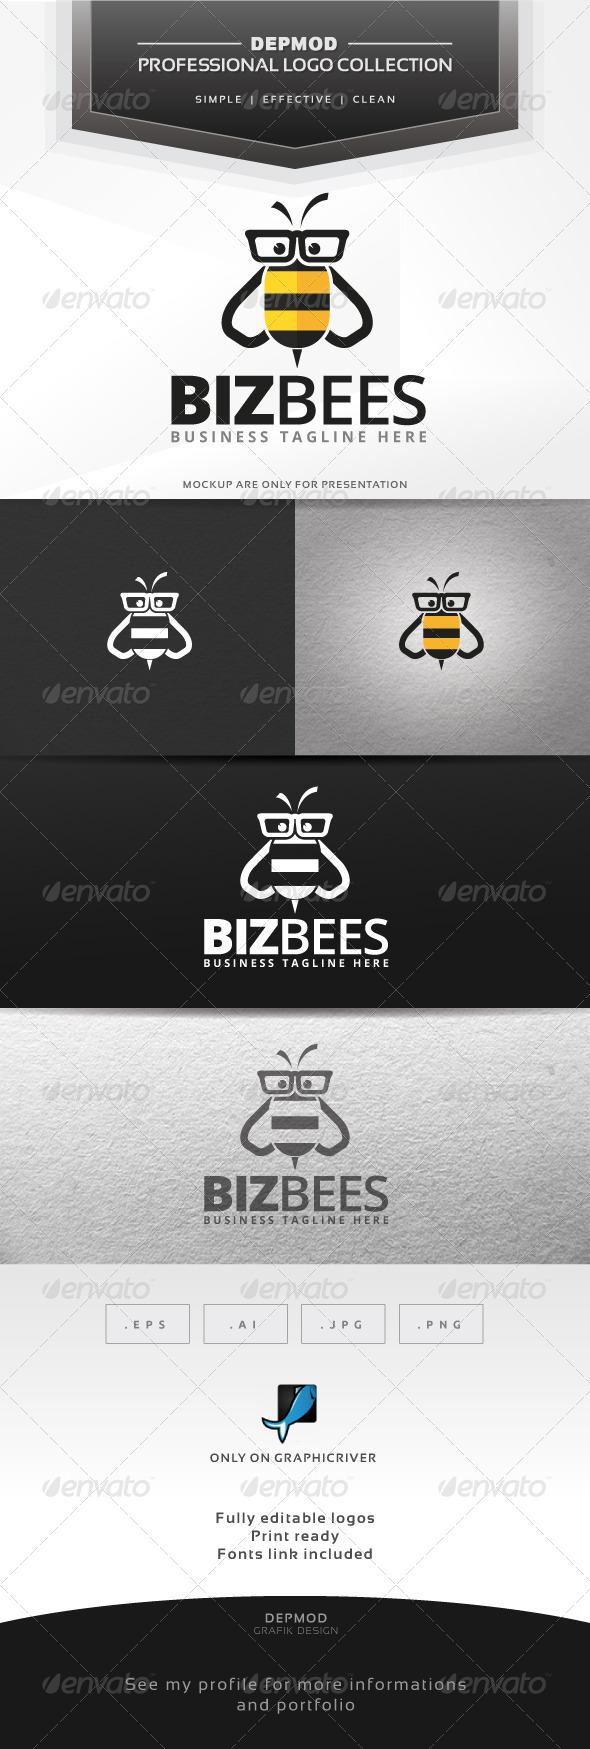 GraphicRiver Biz Bees Logo 6532924